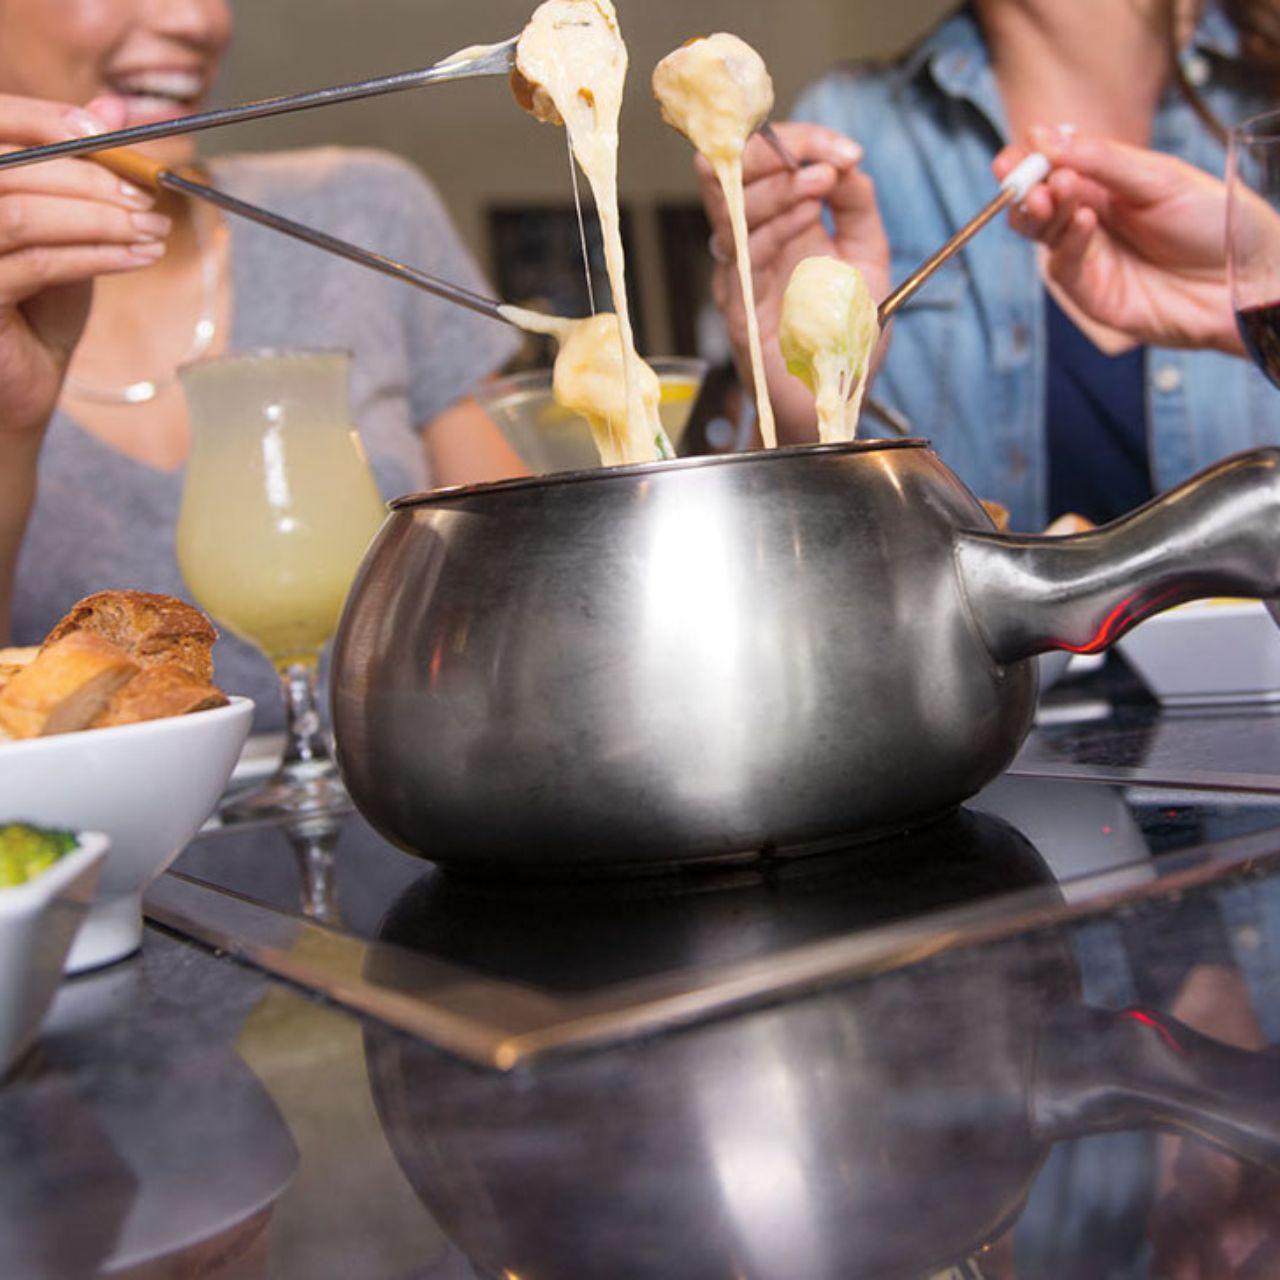 10 Best Fondue Pot With Full Set   Reviews September, 2020